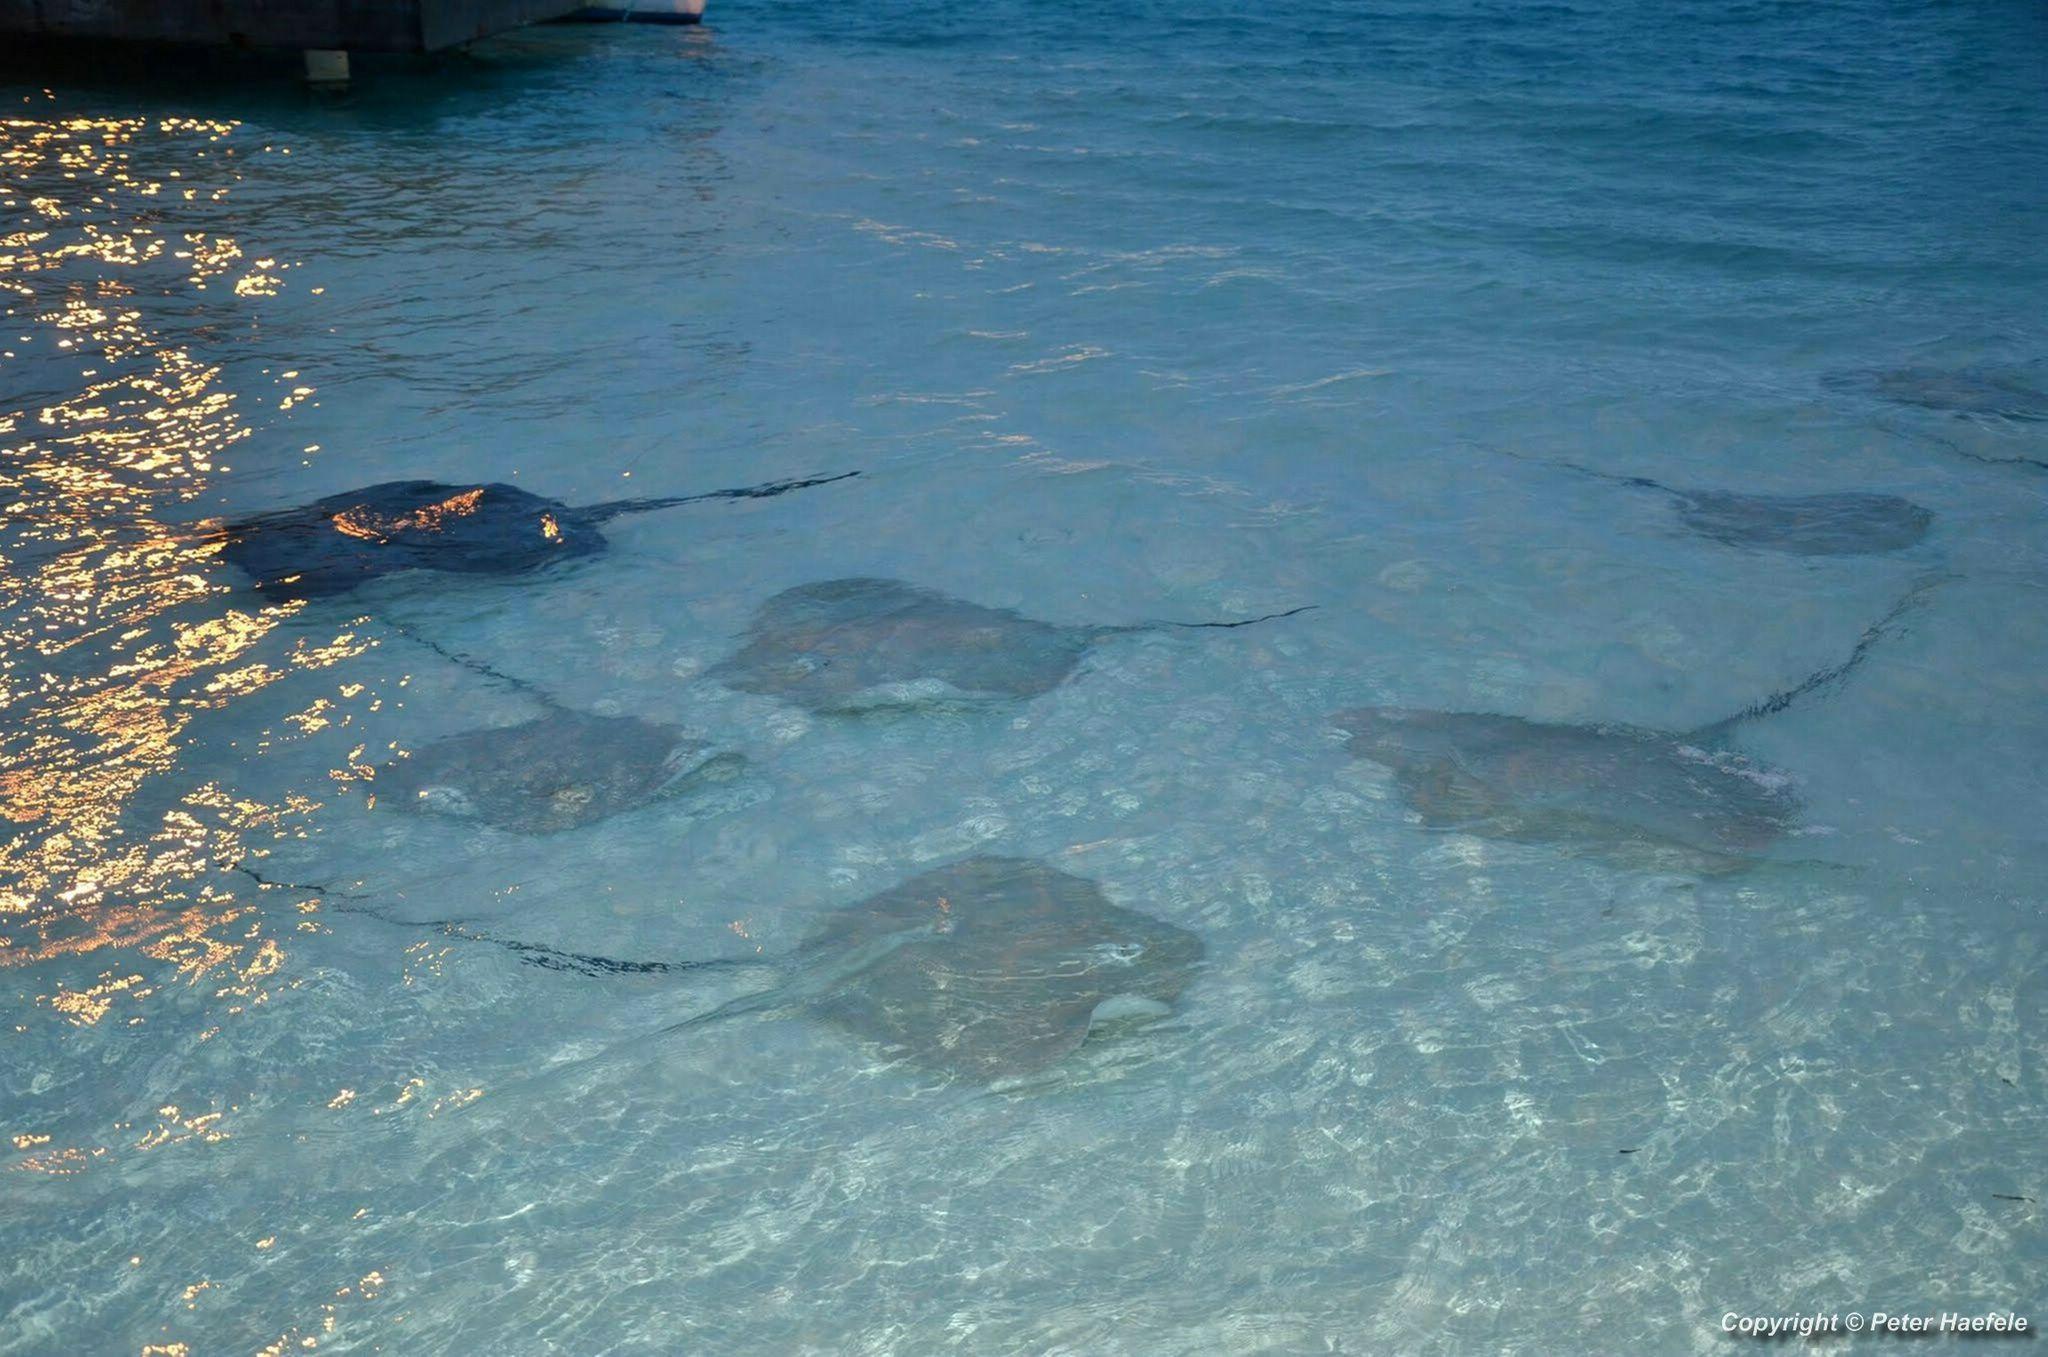 Stachelrochen Fuetterung (Stingray feeding) vor Sun Island, South Ari Atoll Maldives